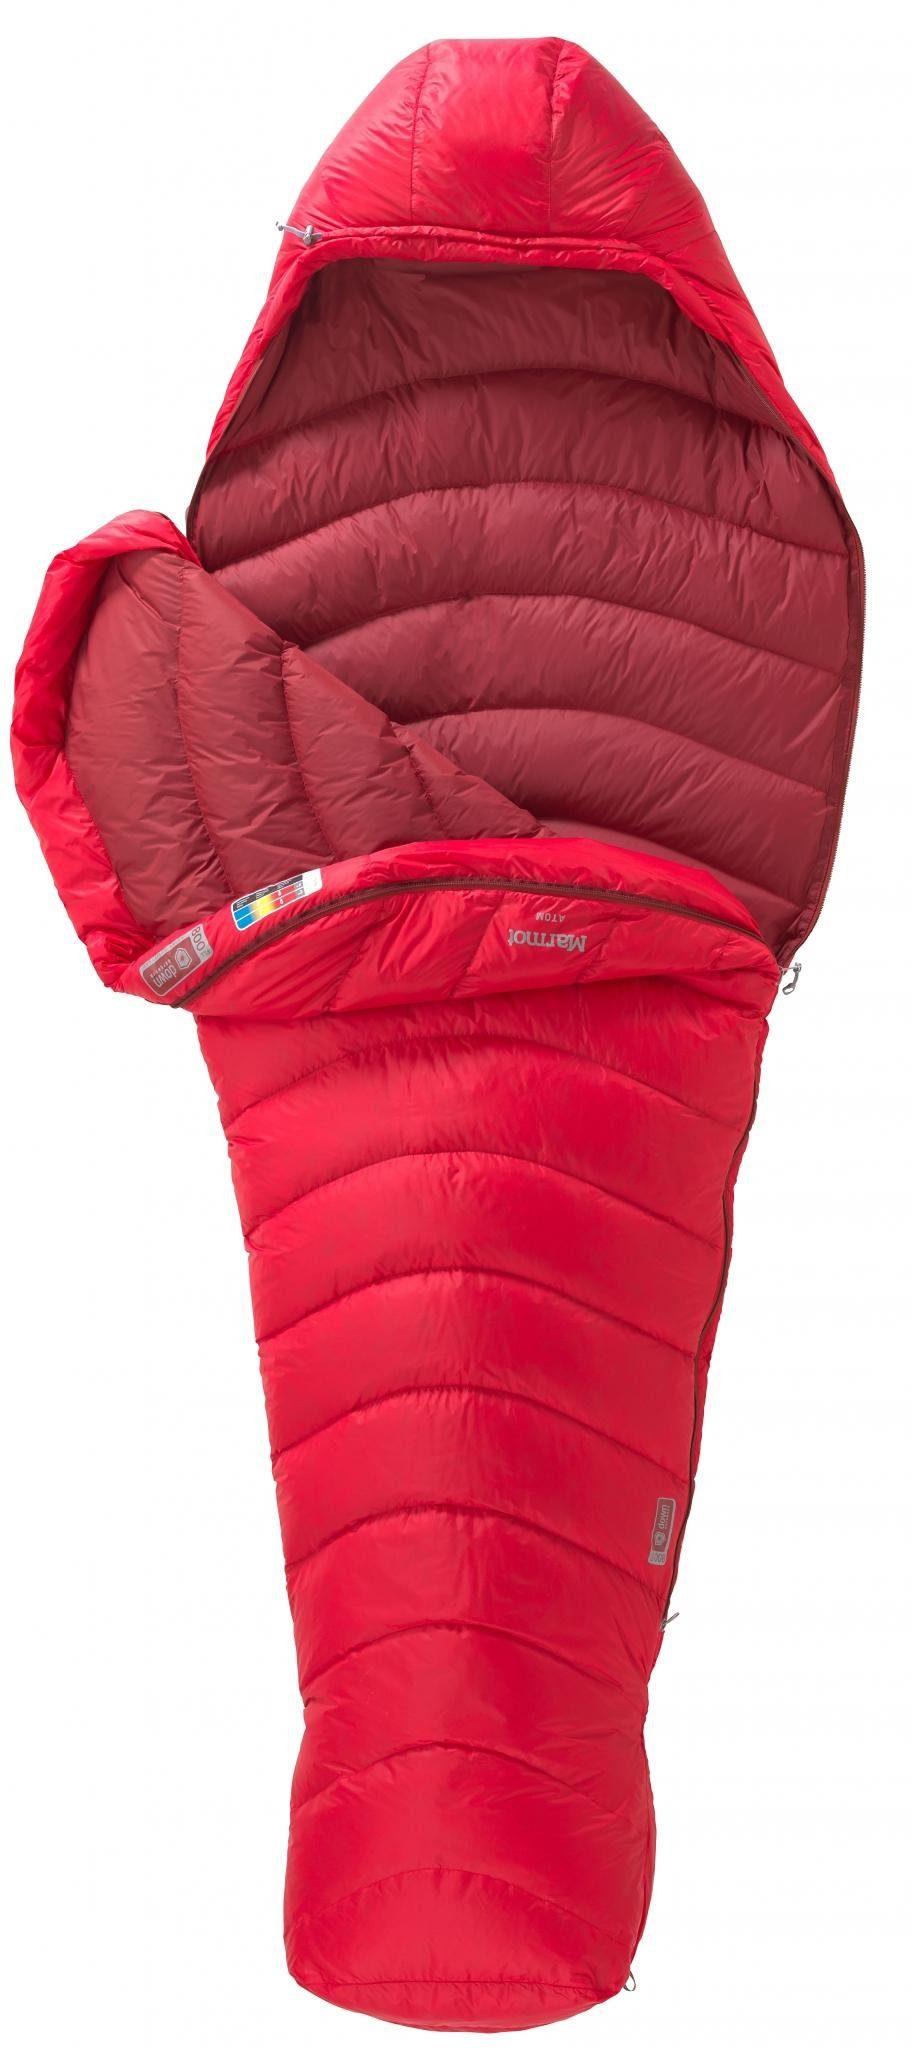 Marmot Schlafsack »Marmot Atom Sleeping Bag Regular«